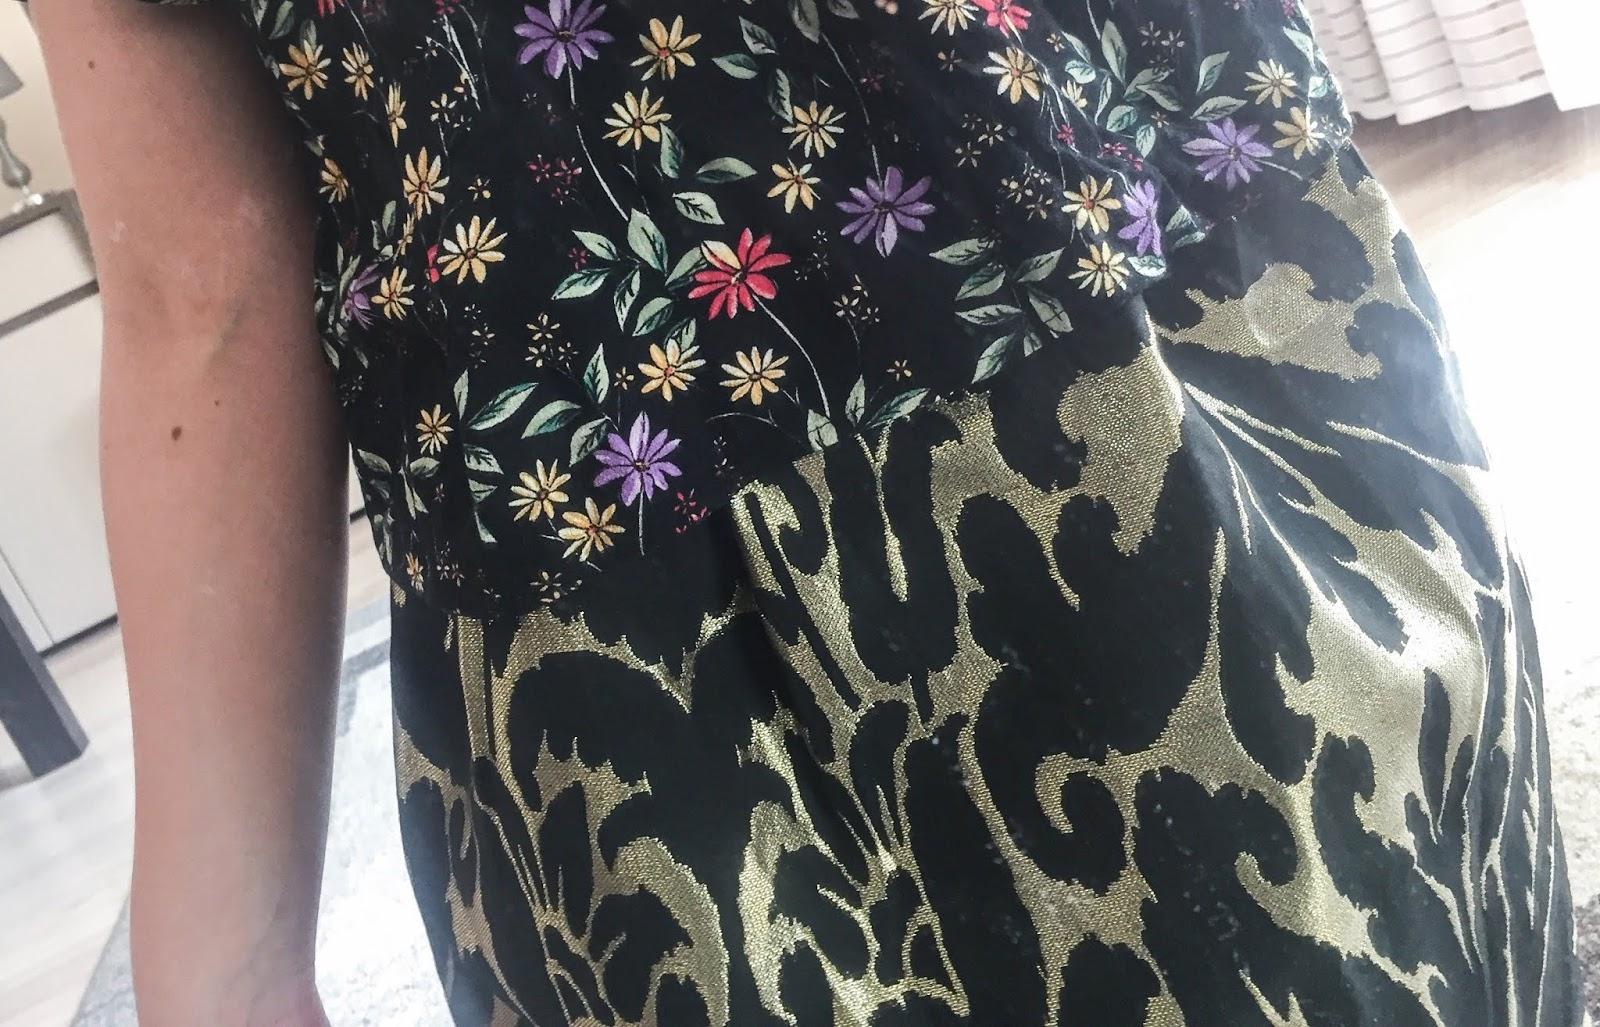 Agatea by Agata Bednarek: 12 Grzechów w ubiorze kobiet